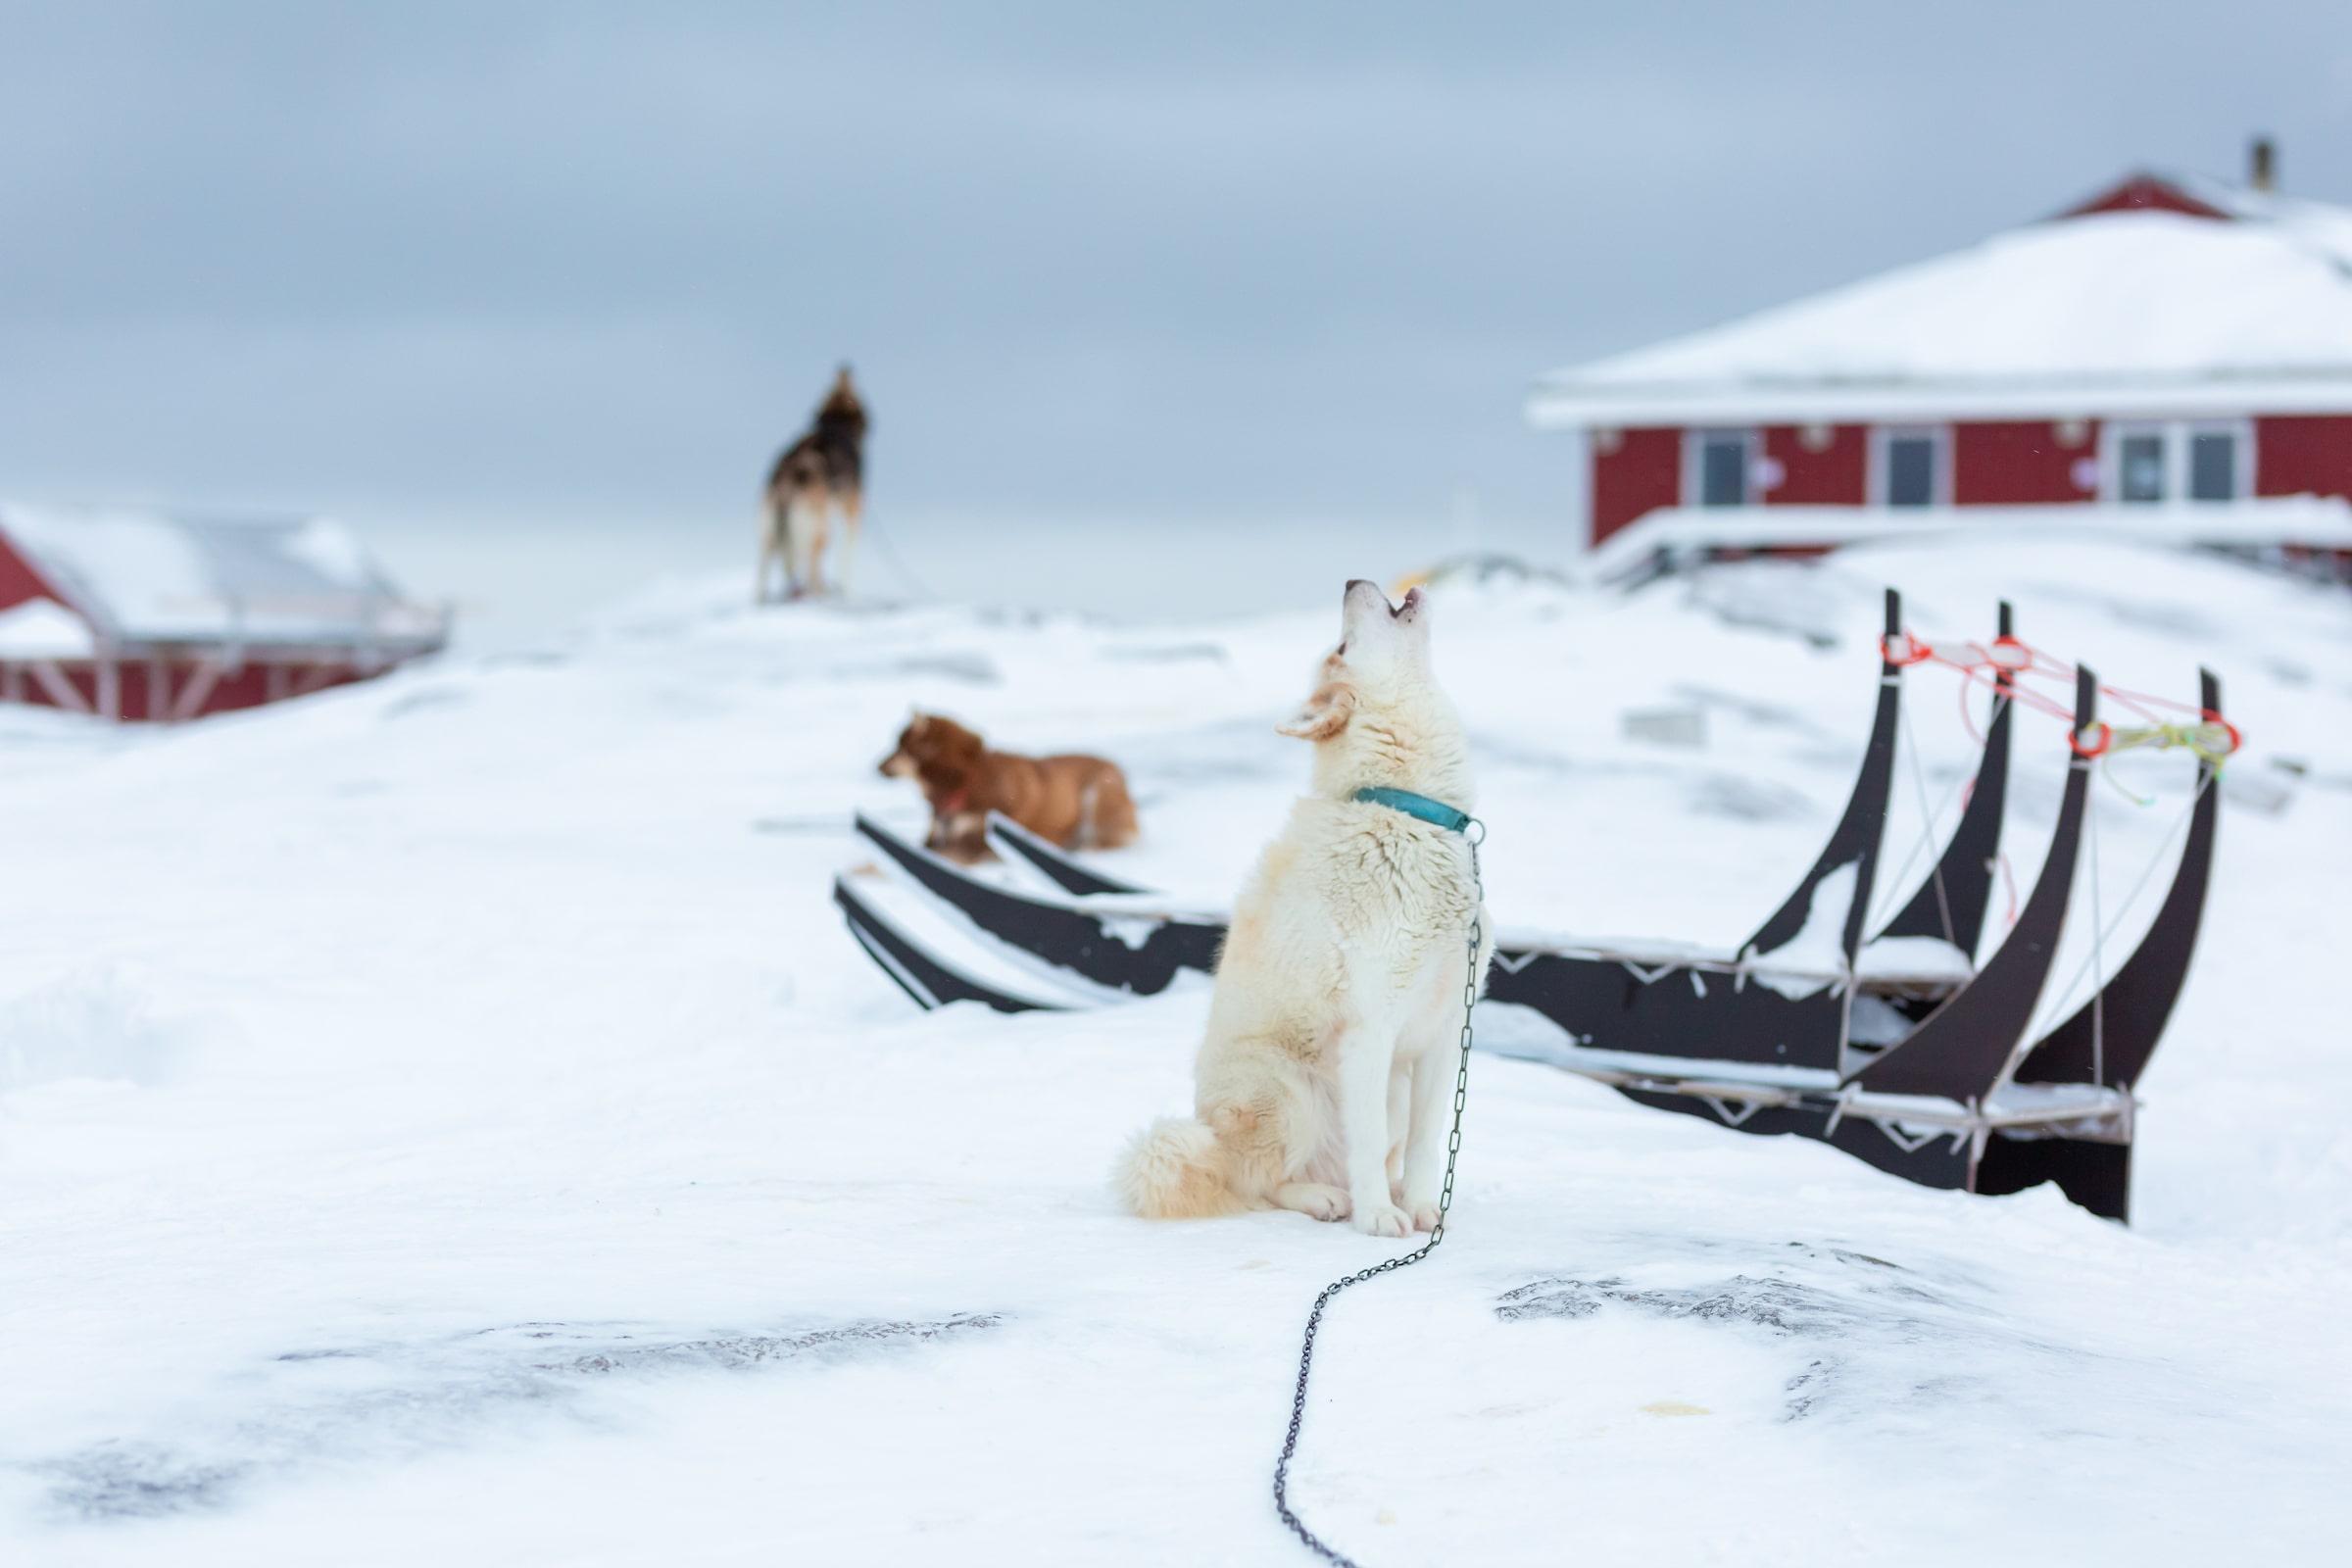 Howling Dog. Photo by Filip Gielda - Visit Greenland